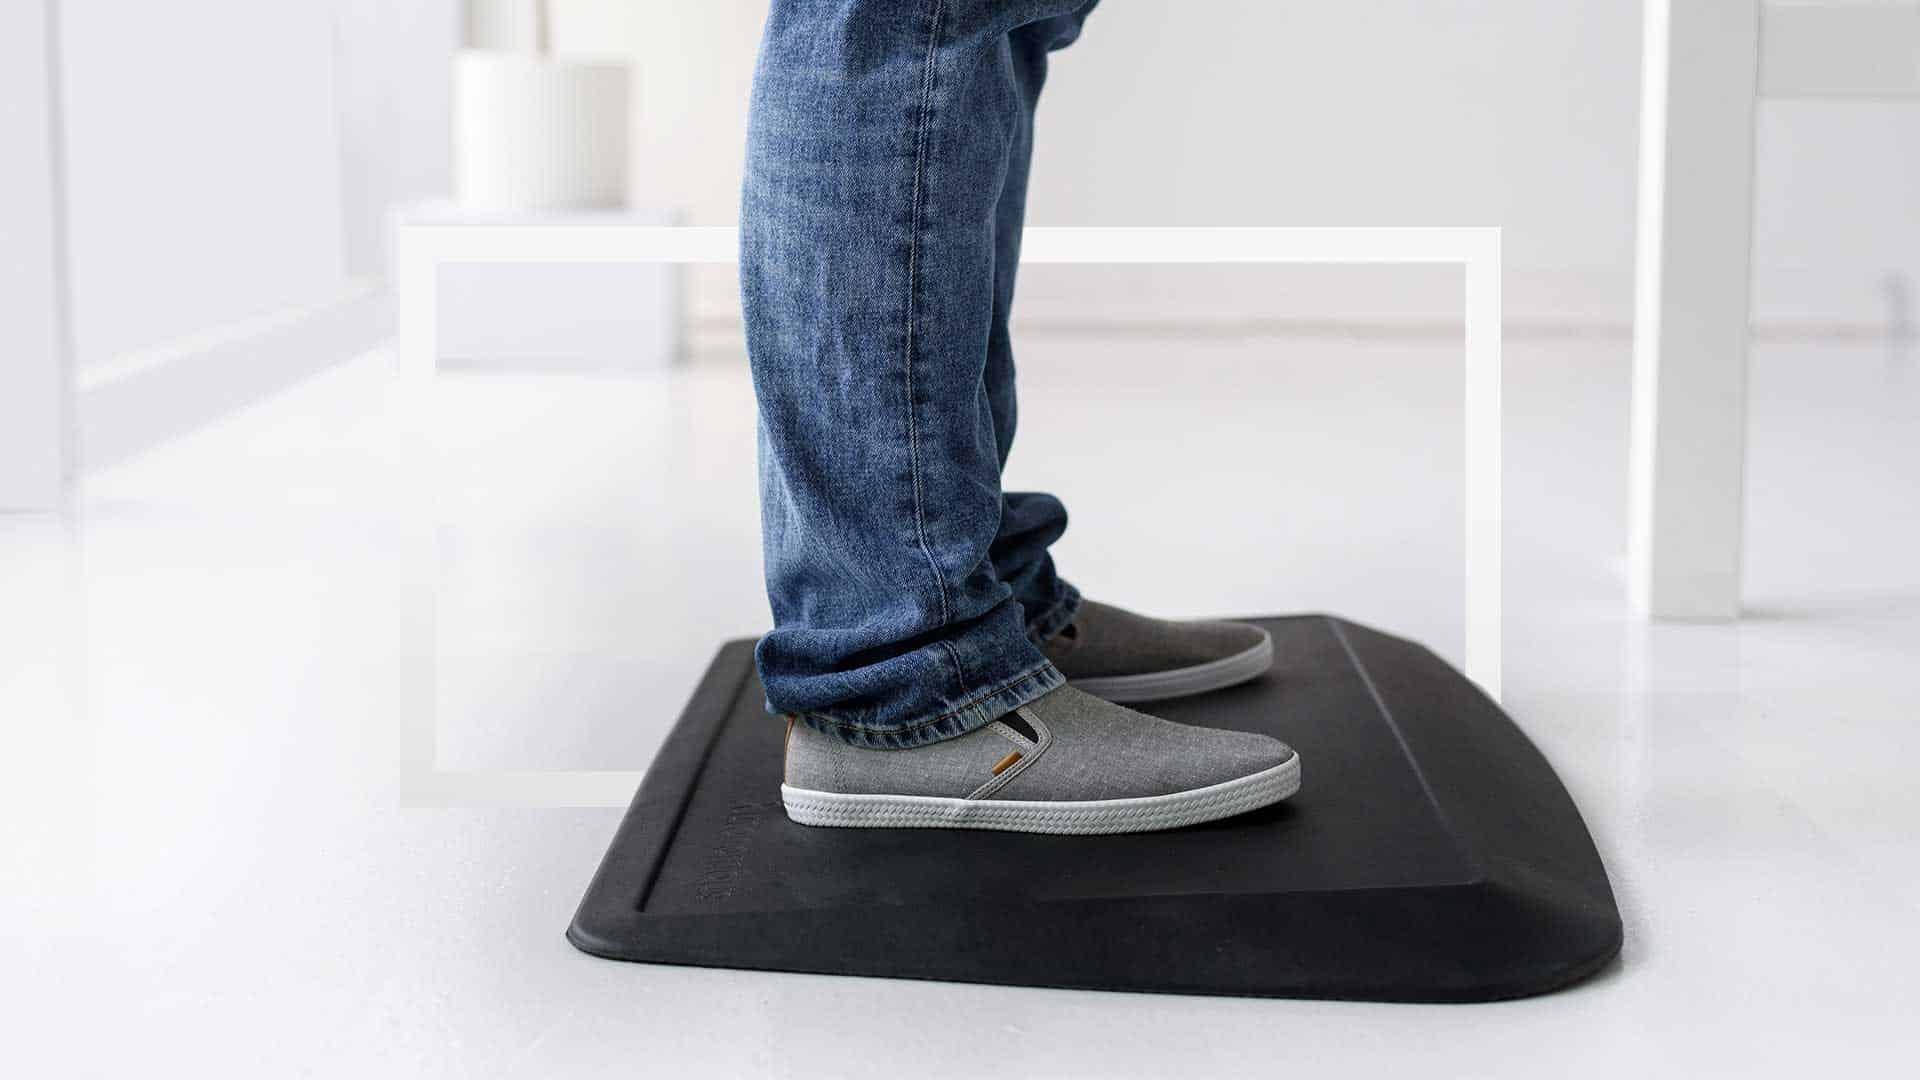 5 Best Anti Fatigue Mats For Underfoot